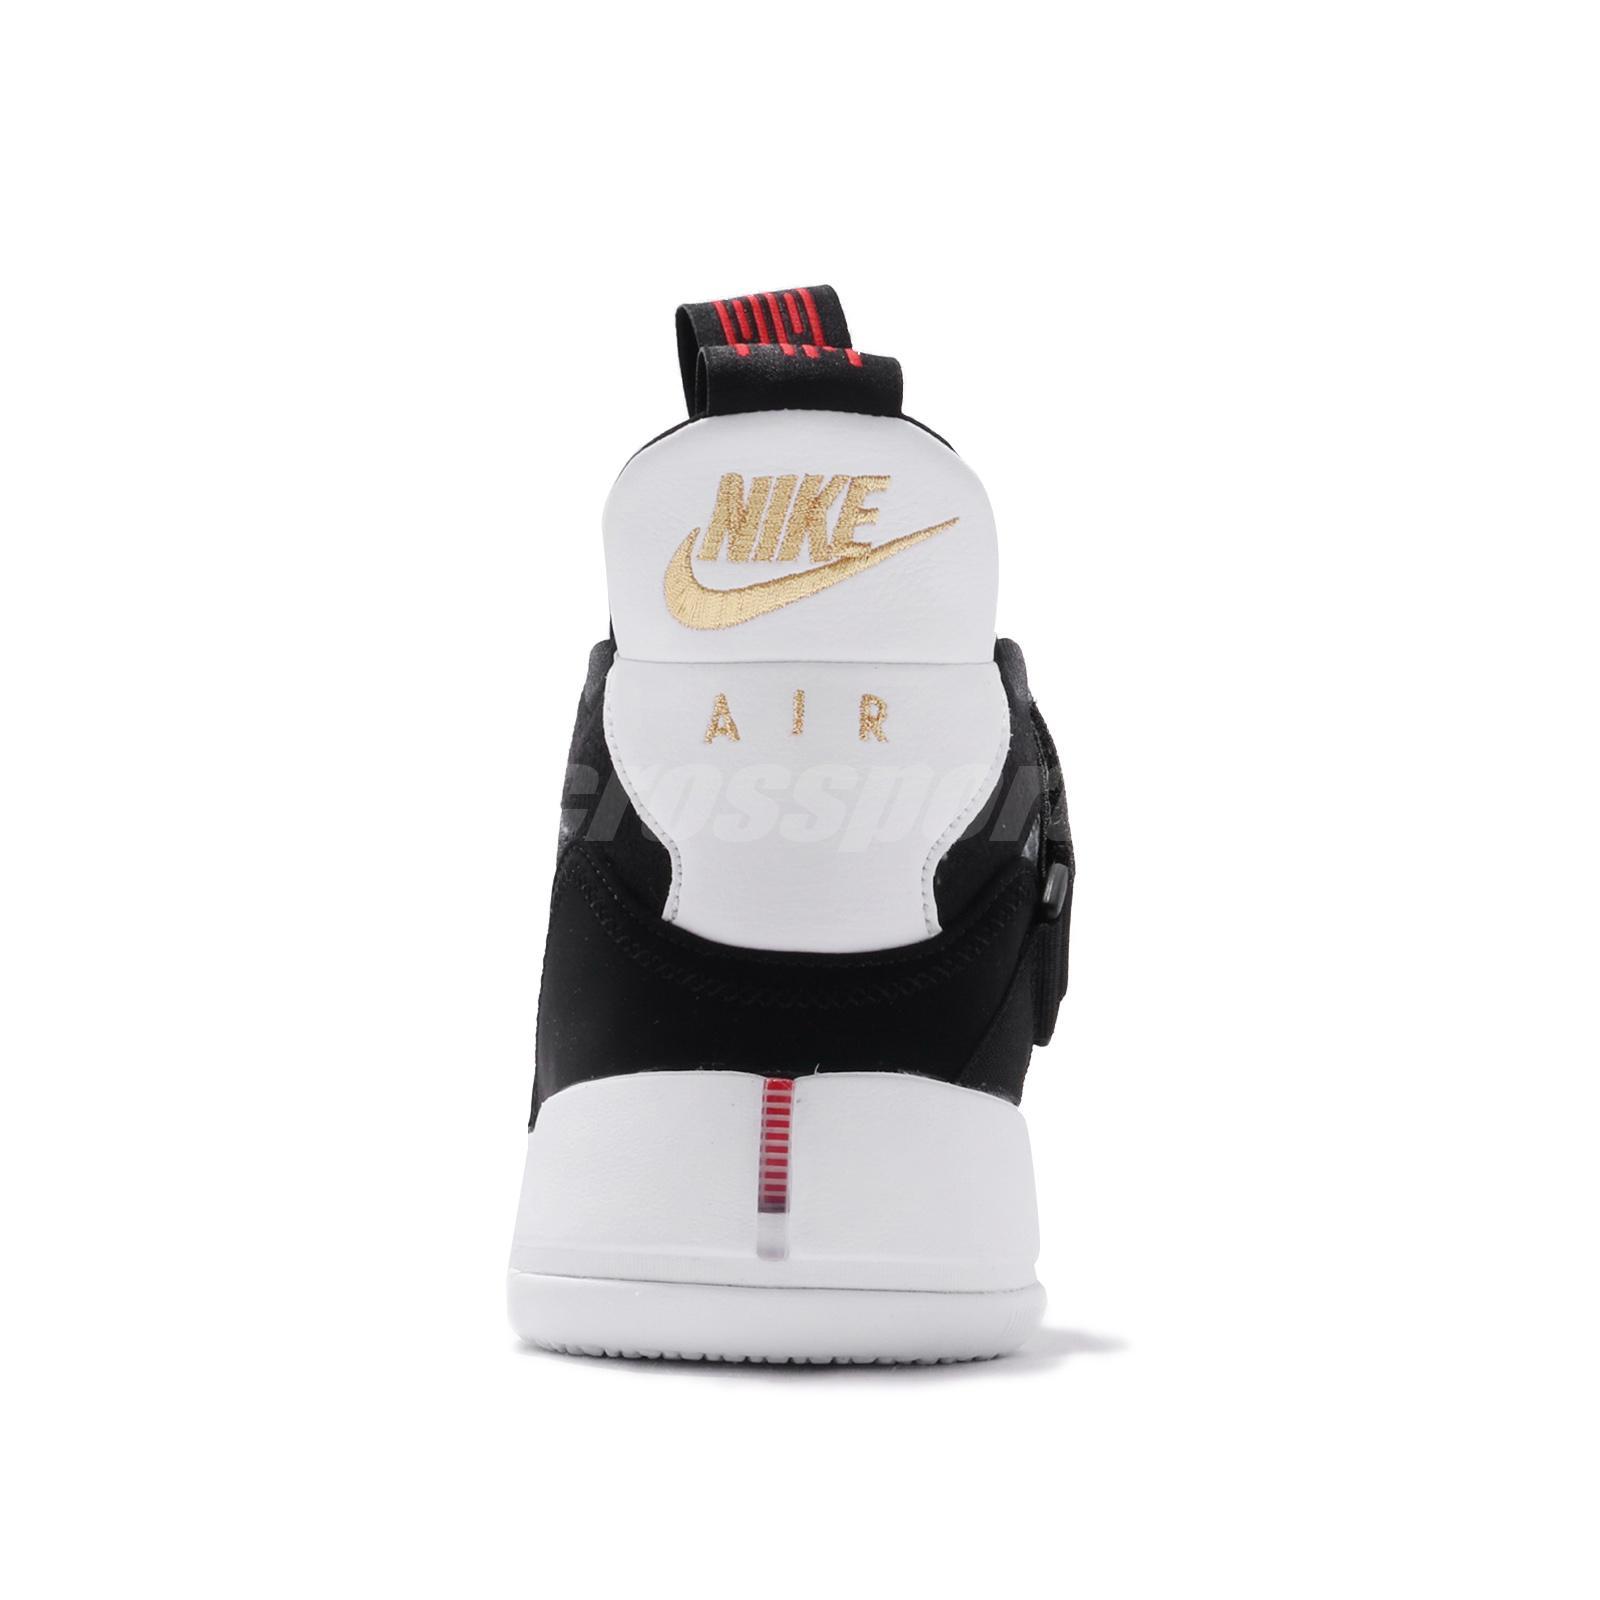 7805e67d6ac362 Nike Air Jordan XXXIII PF 33 Black Camo Gold Mens Basketball Shoes ...